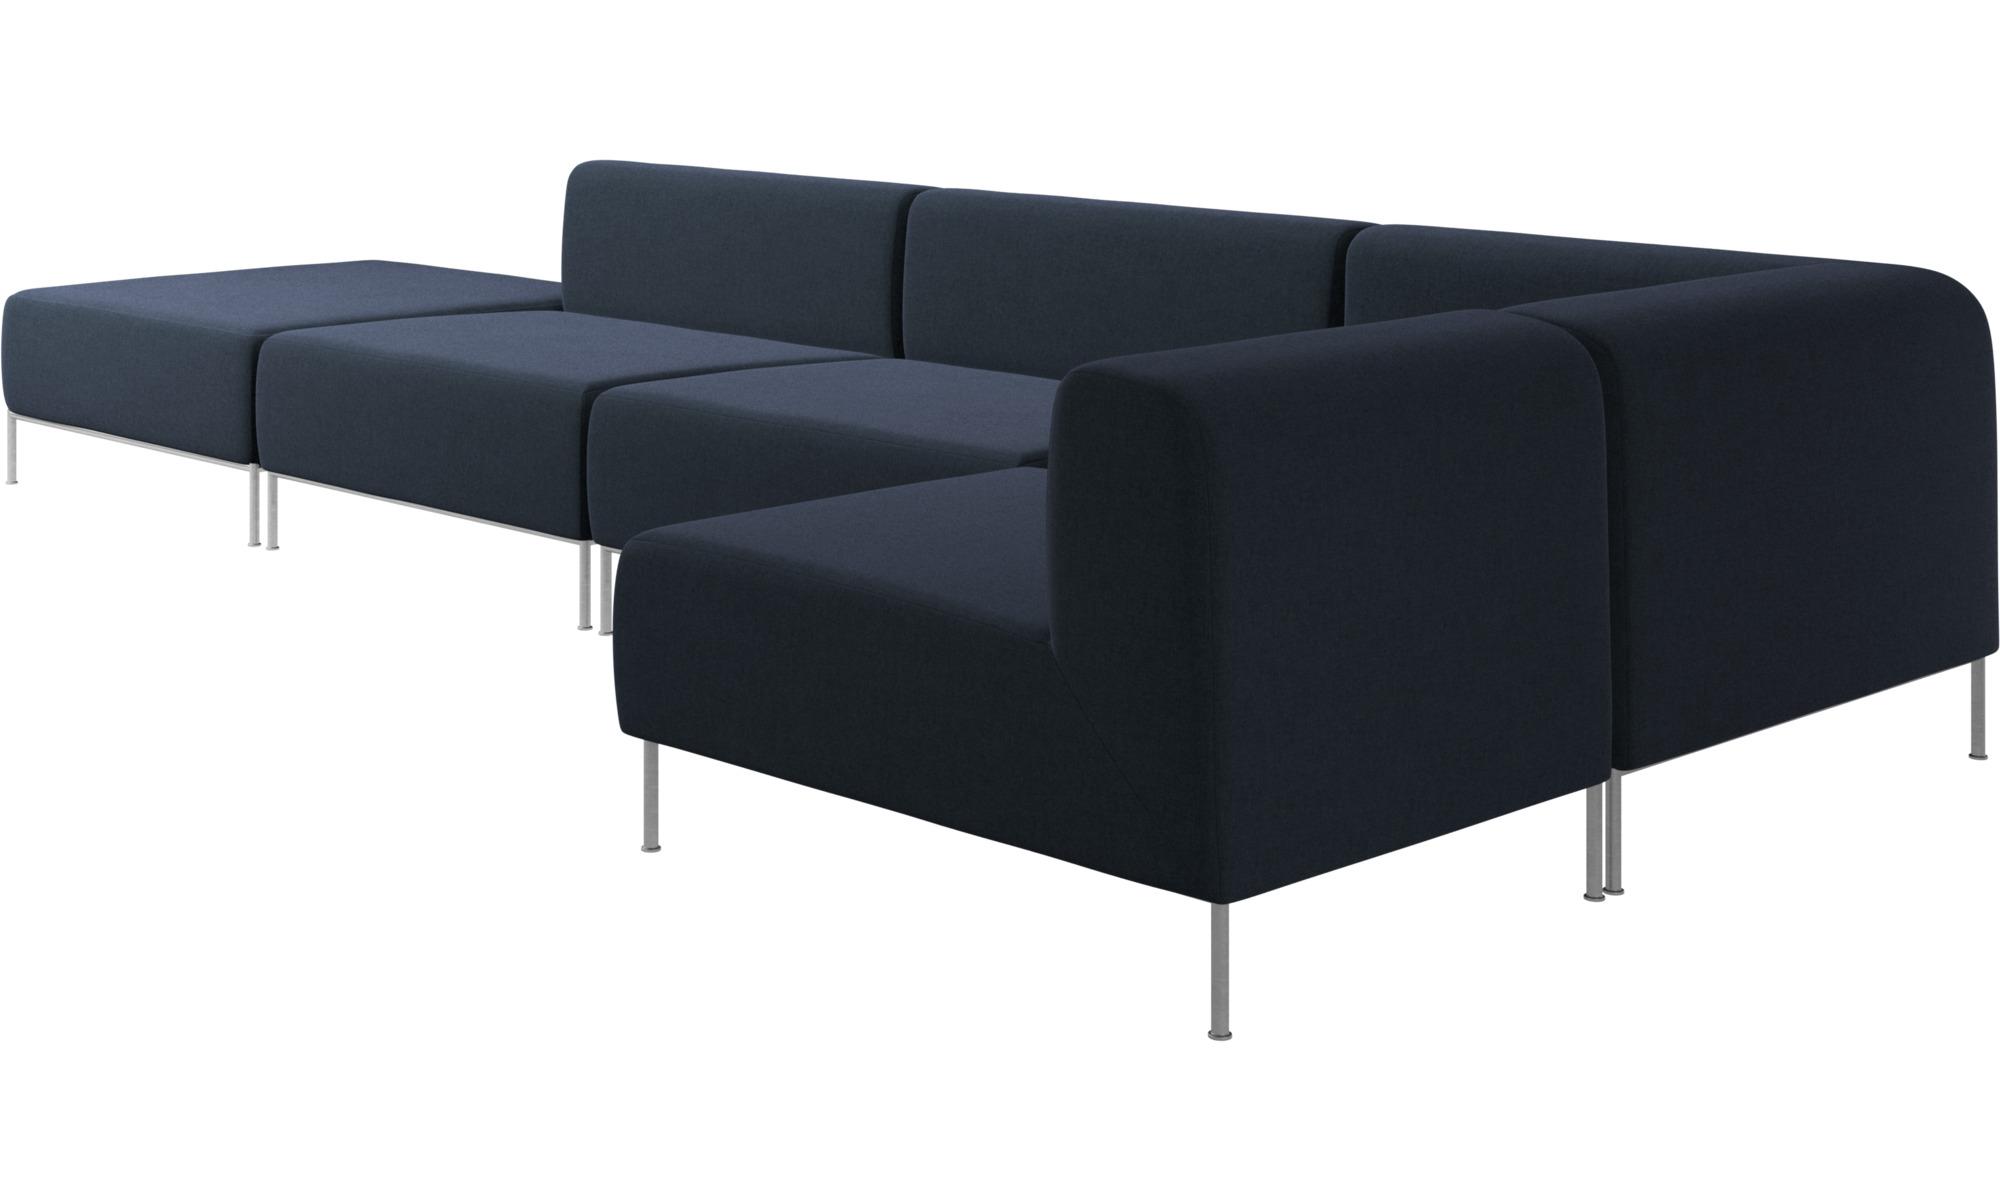 Modular Sofas Miami Corner Sofa With Pouf On Left Side Blue Fabric